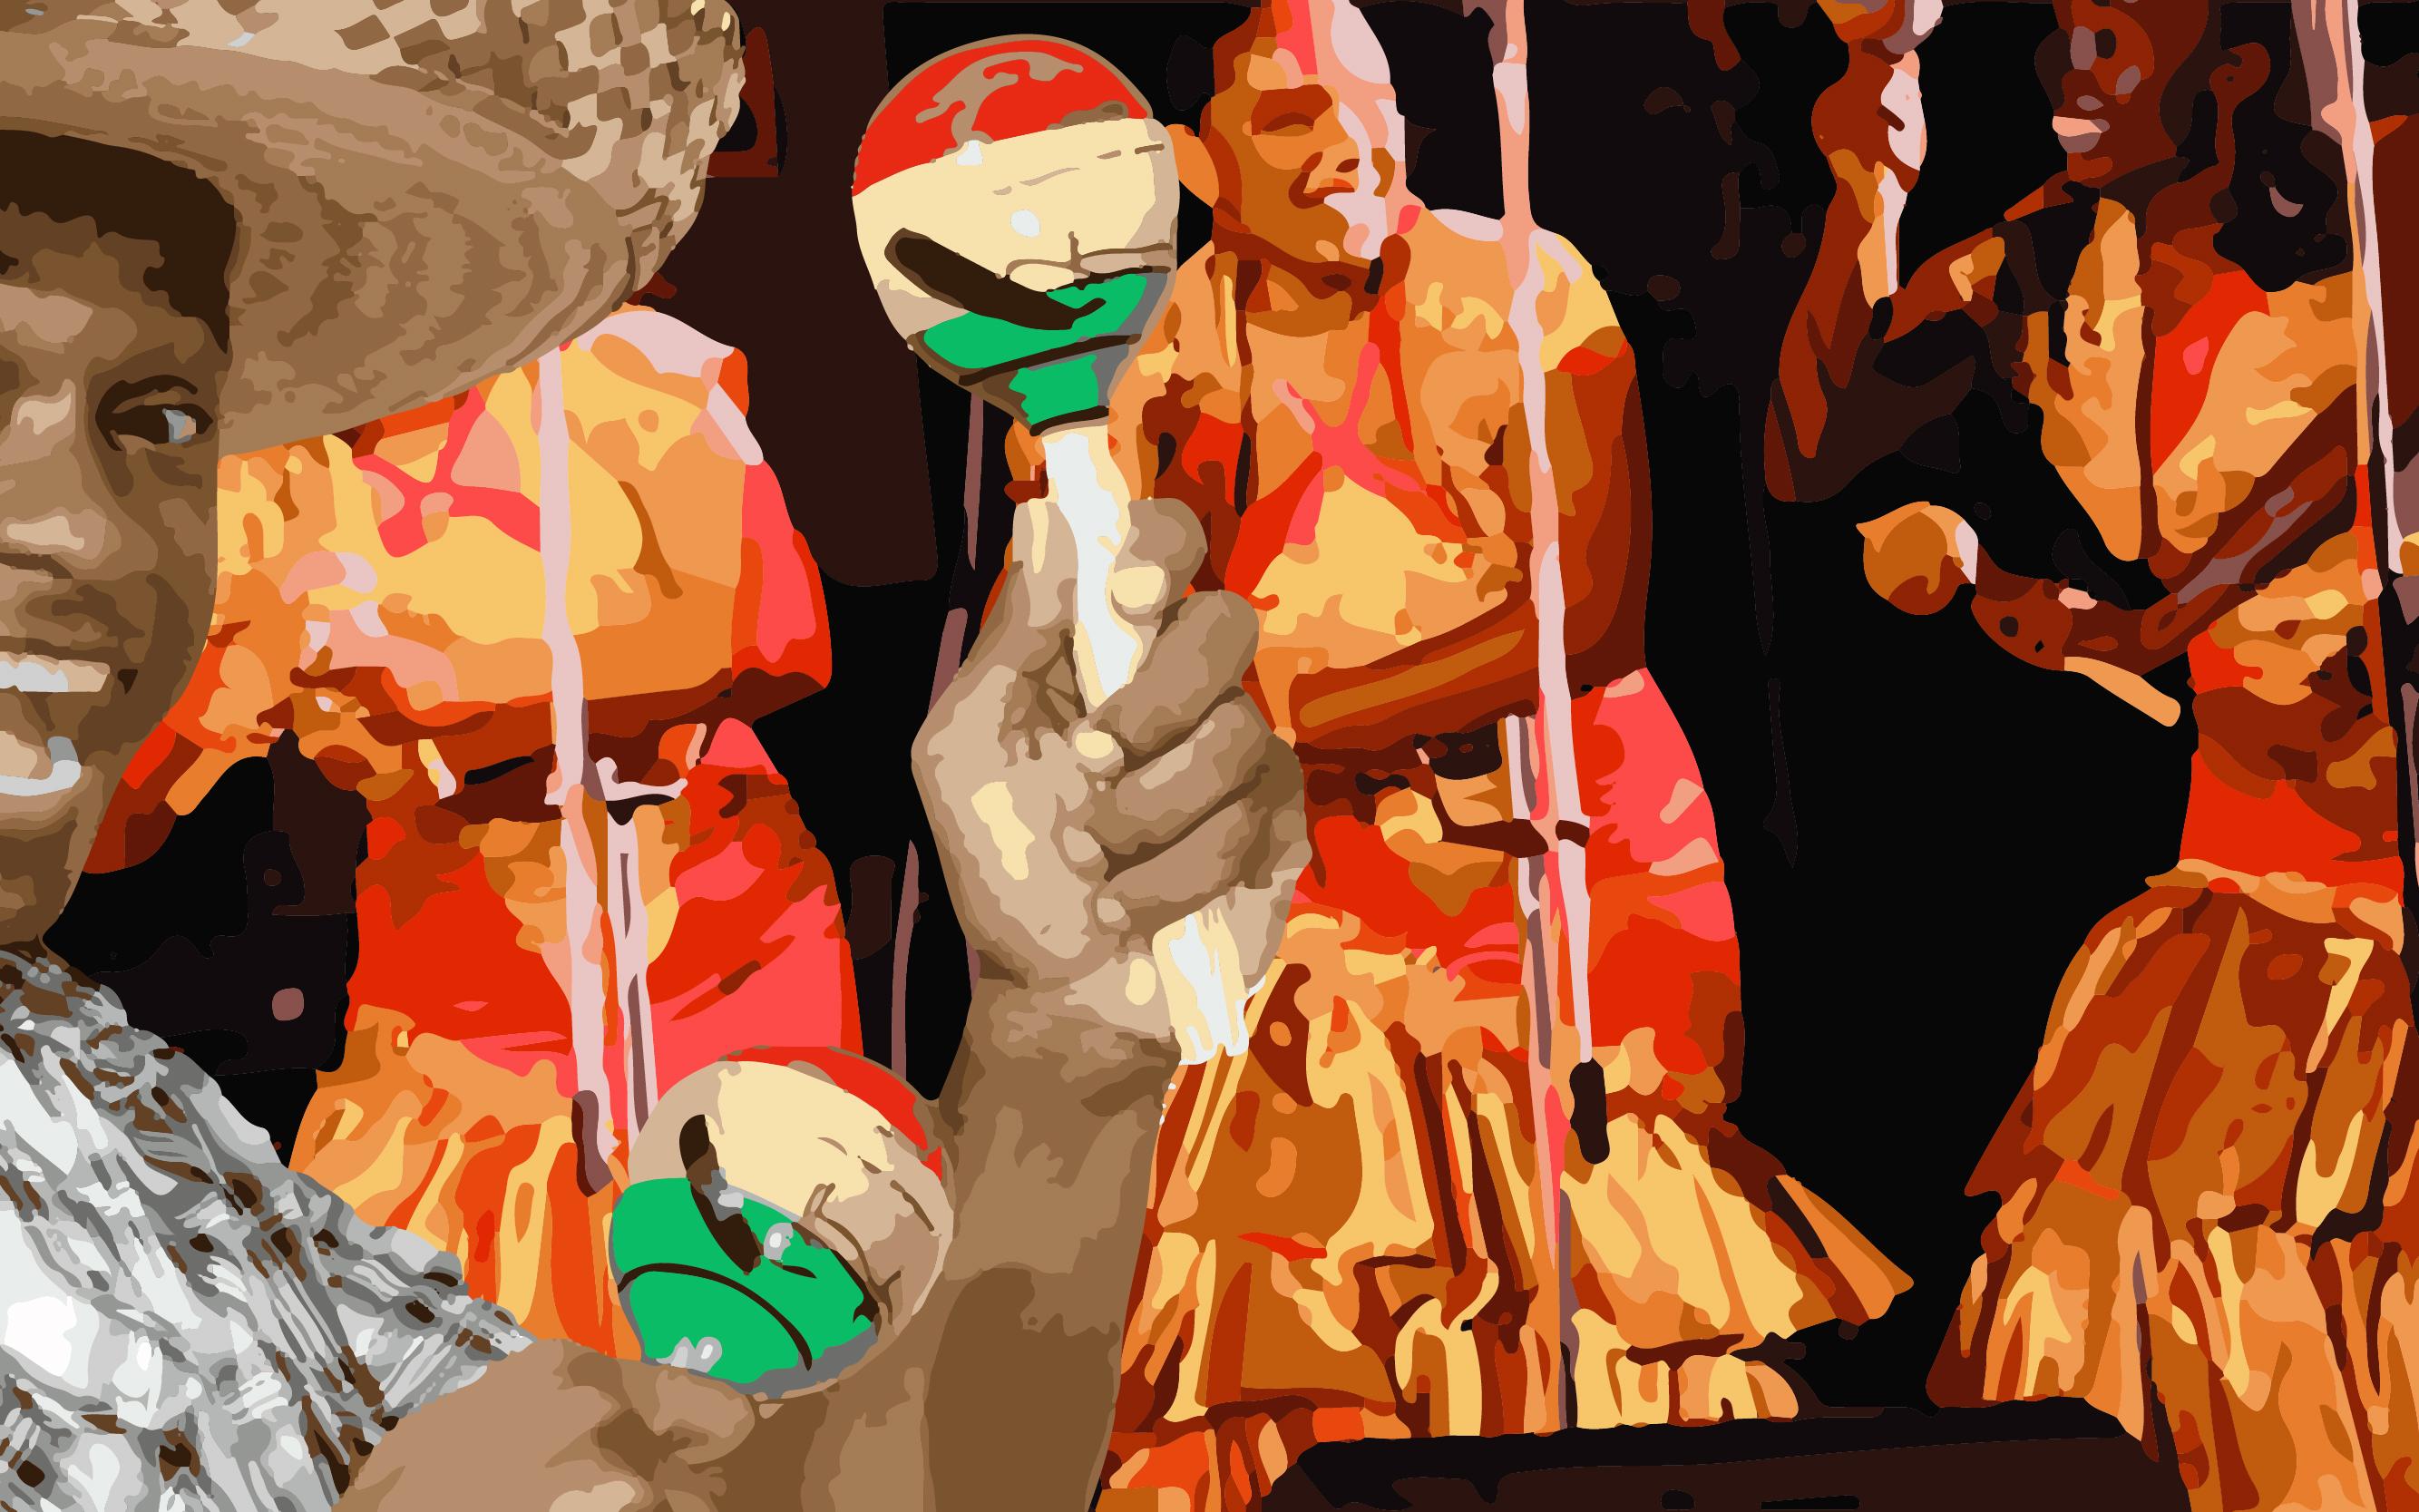 Parang Music Destination Trinidad And Tobago Tours Holidays Vacations And Travel Guide